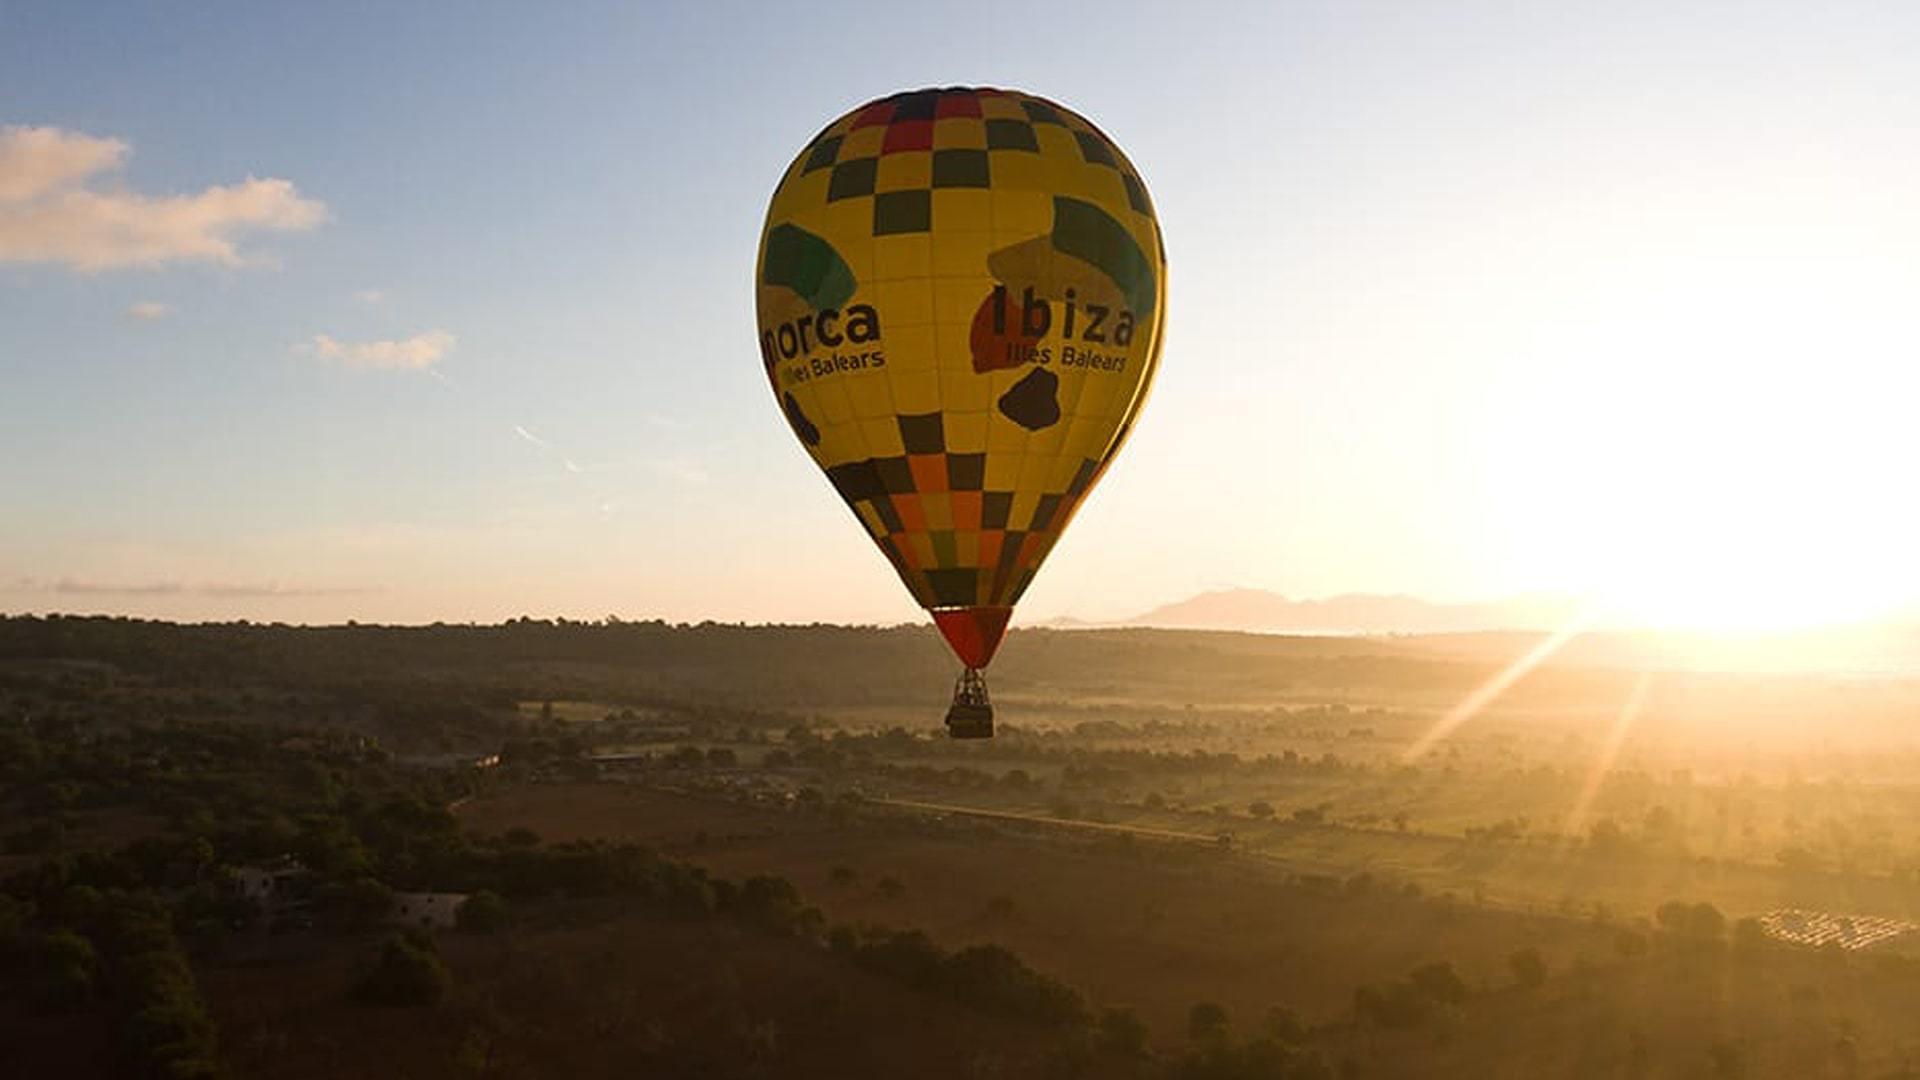 Ibiza balloon up in malllorca hot air balloons championships min